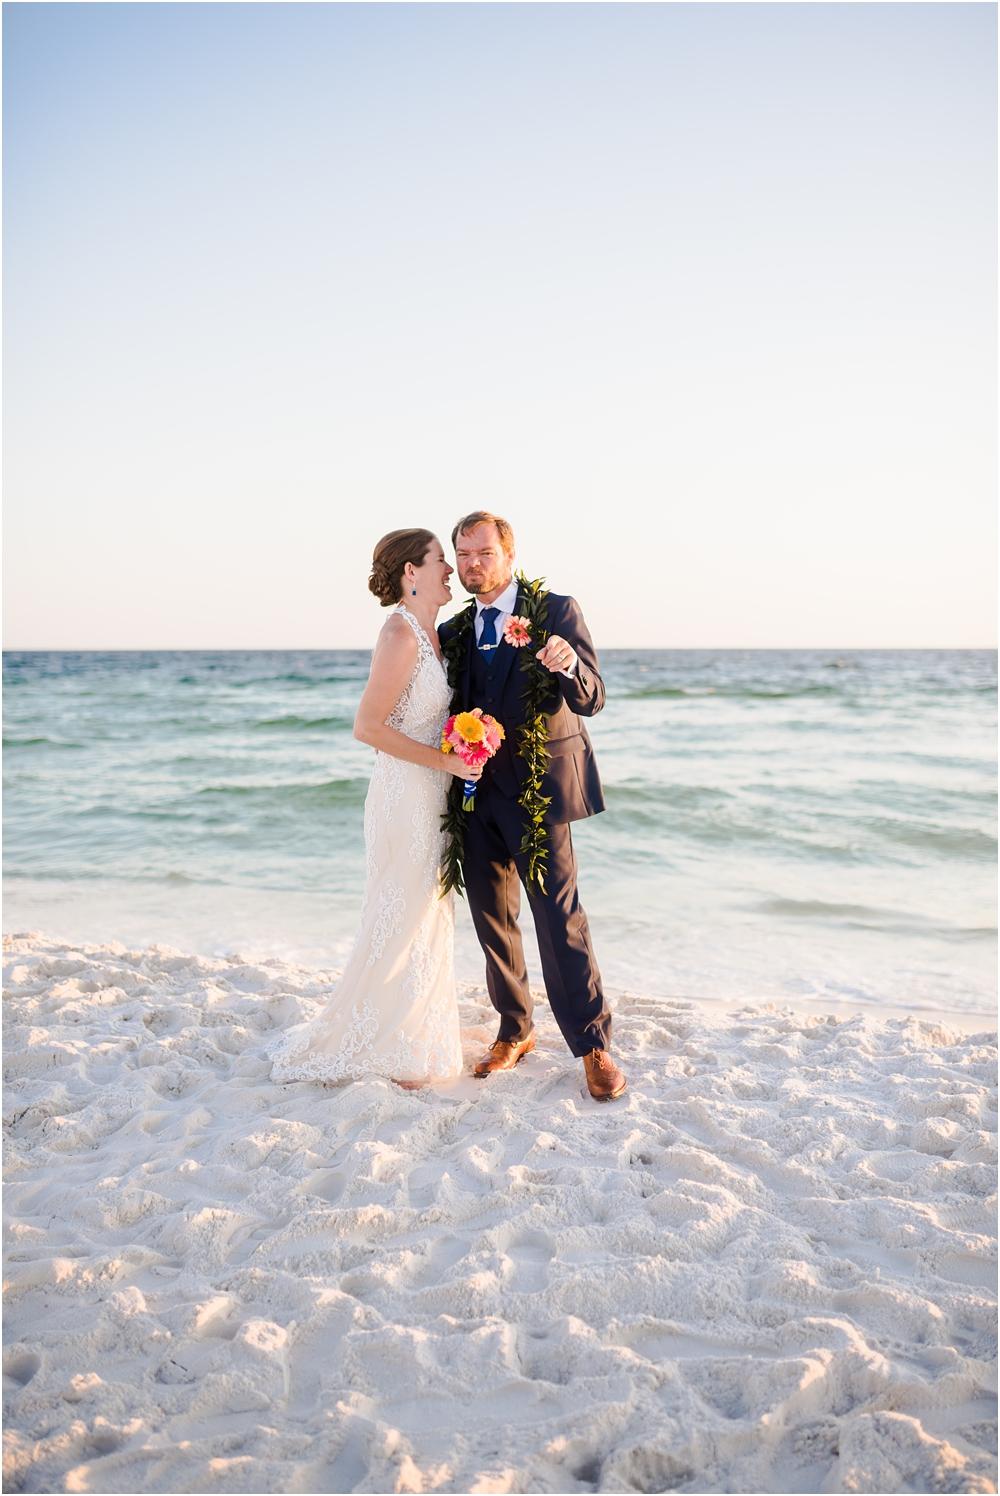 ledman-wedding-kiersten-stevenson-photography-30a-panama-city-beach-dothan-tallahassee-(457-of-763).JPG